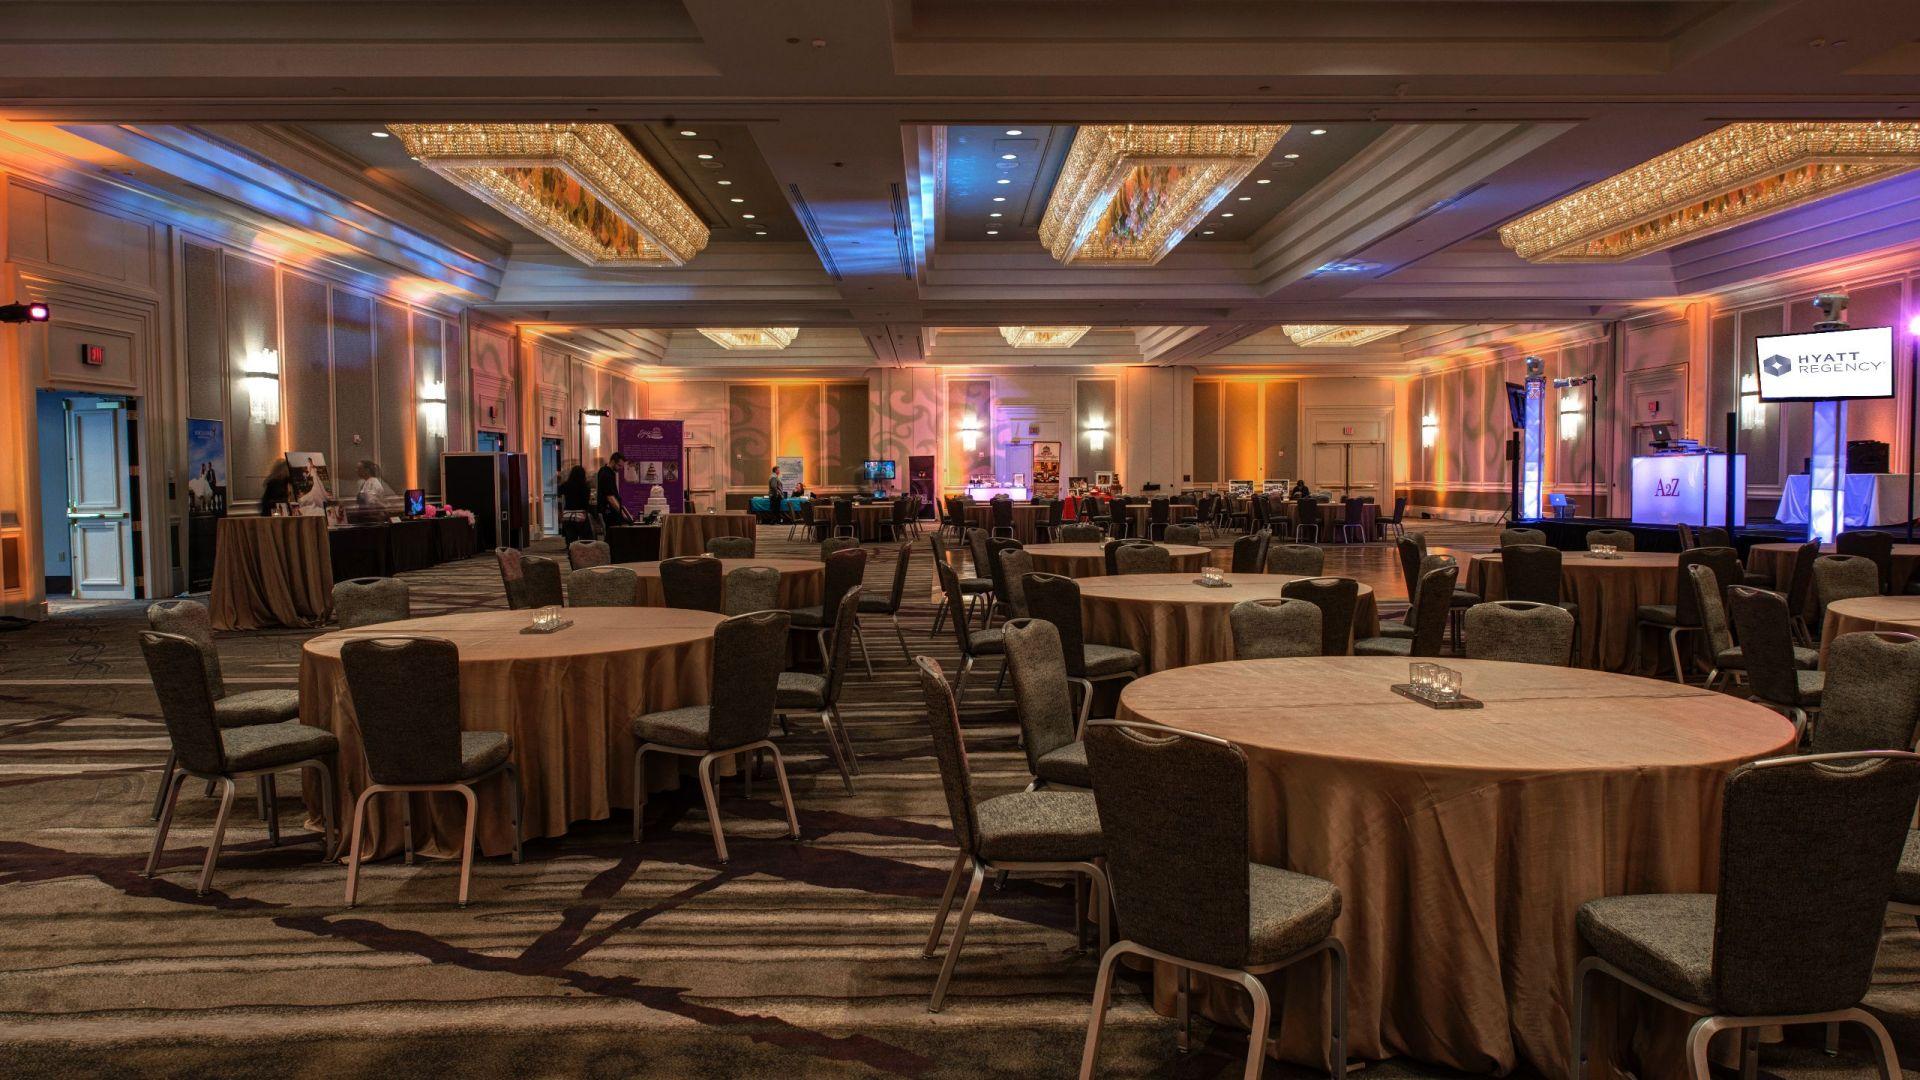 Hotel ballroom set up for event